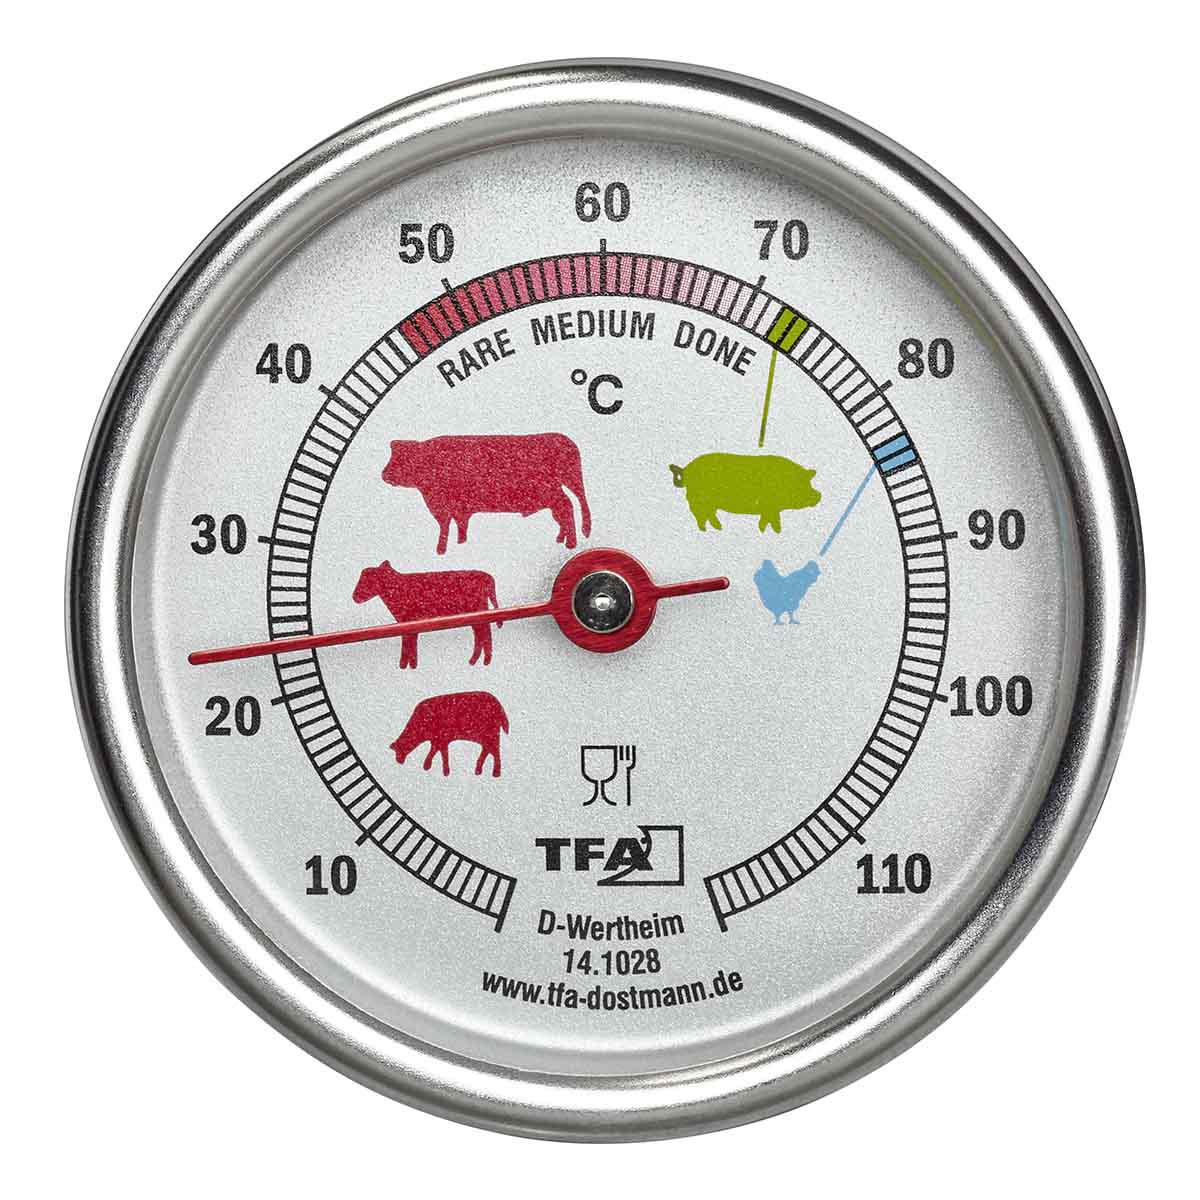 14-1028-analoges-bratenthermometer-ansicht-1200x1200px.jpg